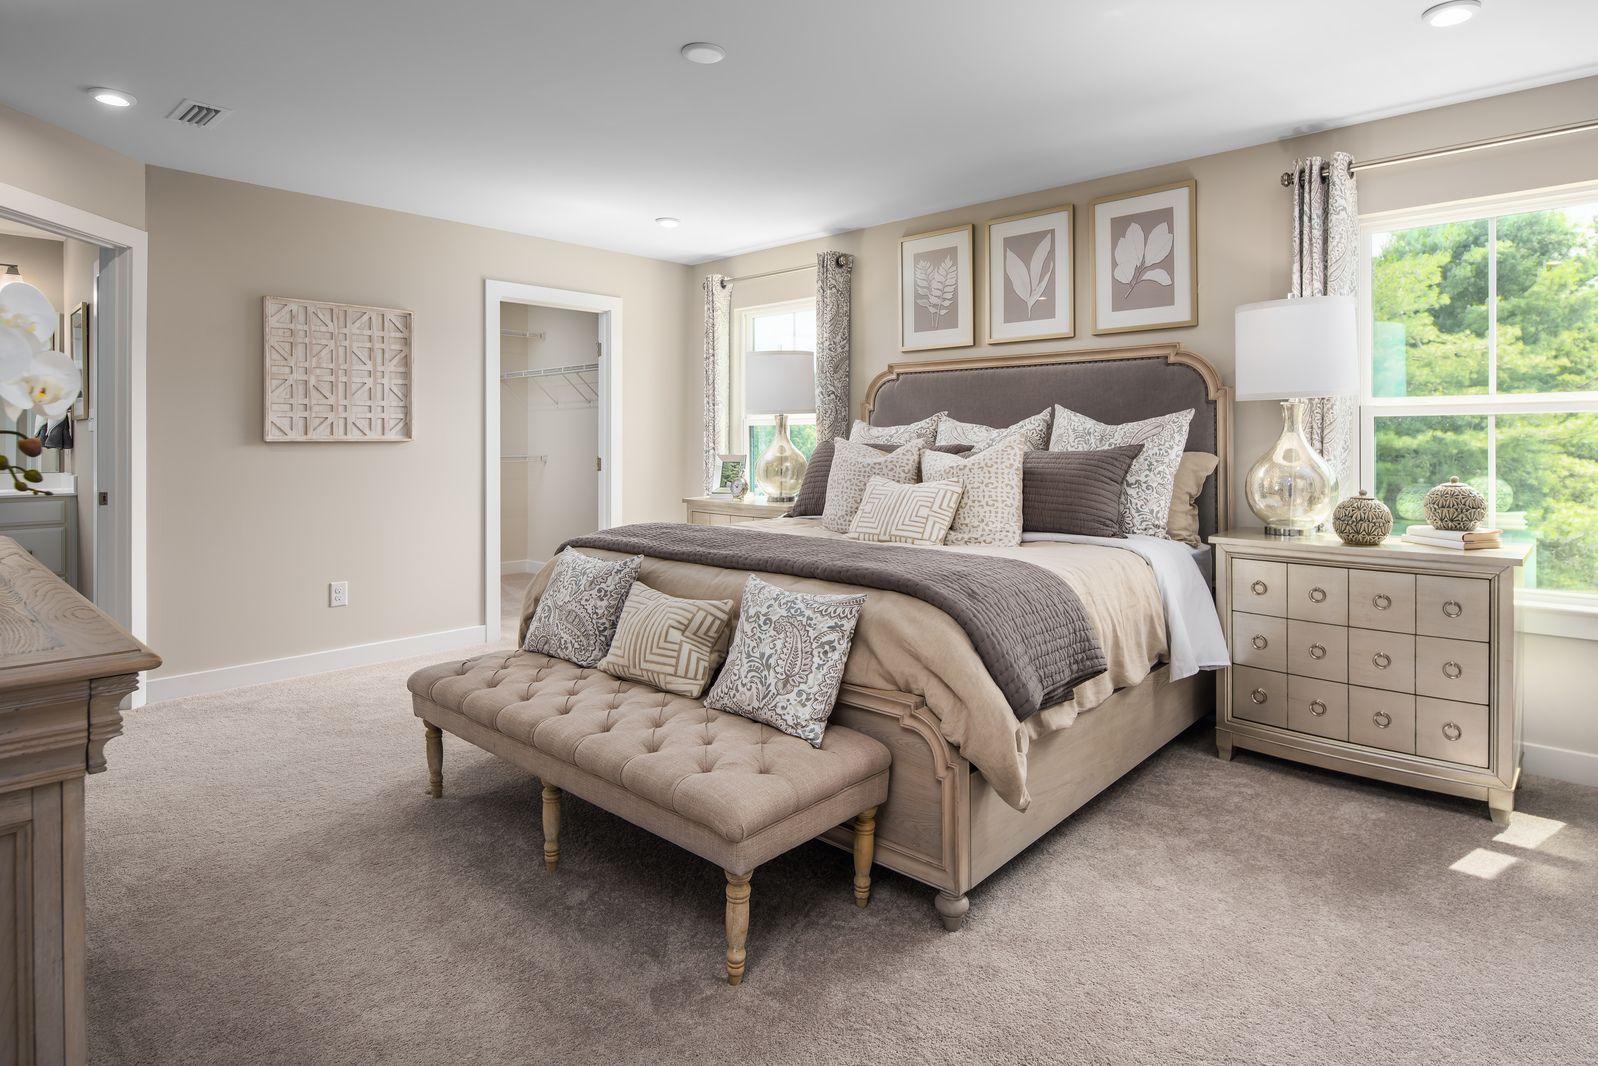 Bedroom featured in the Lehigh at Hartland By Ryan Homes in Washington, VA